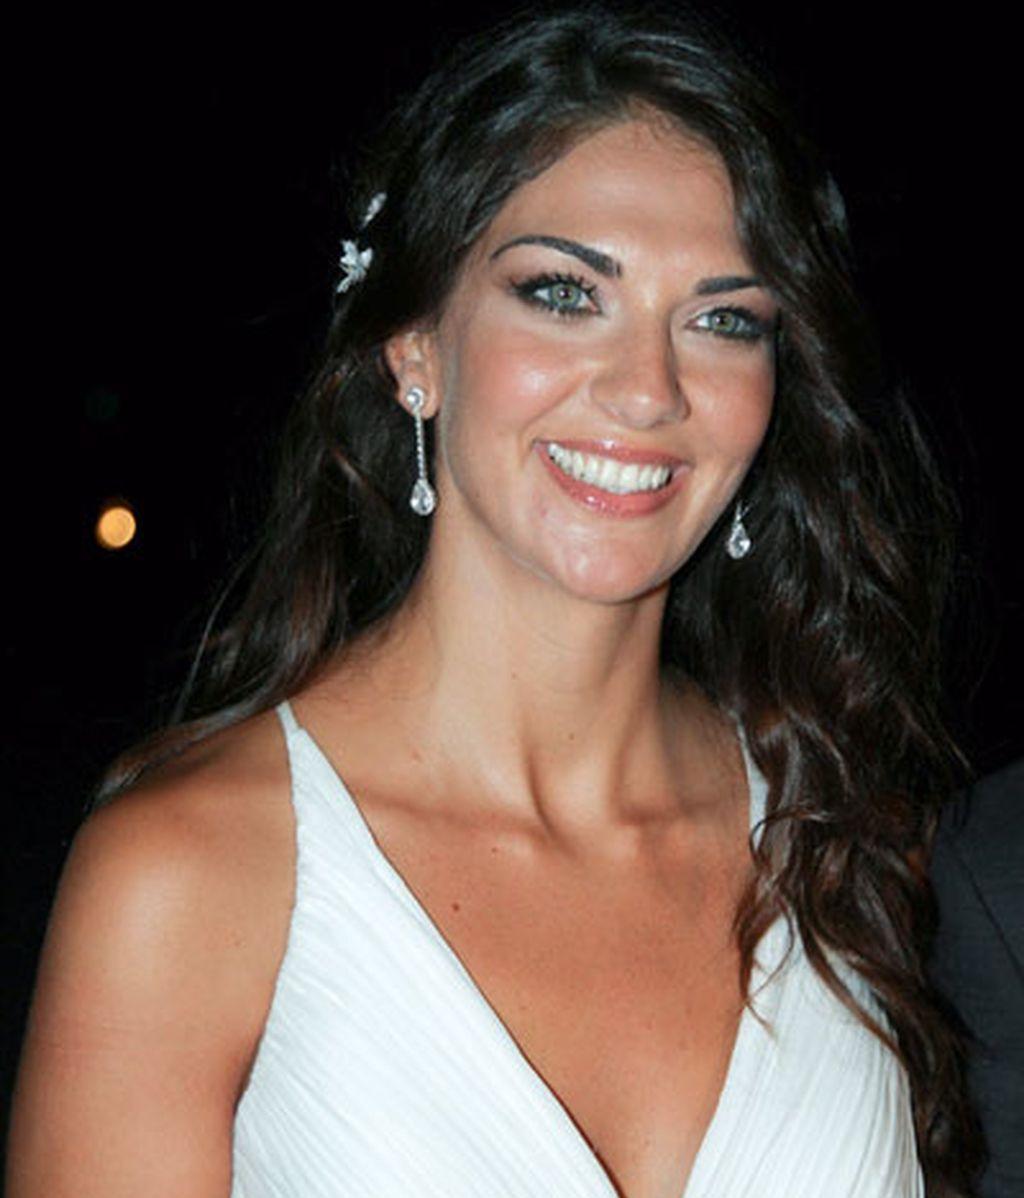 La ex Miss España, Lorena Bernal